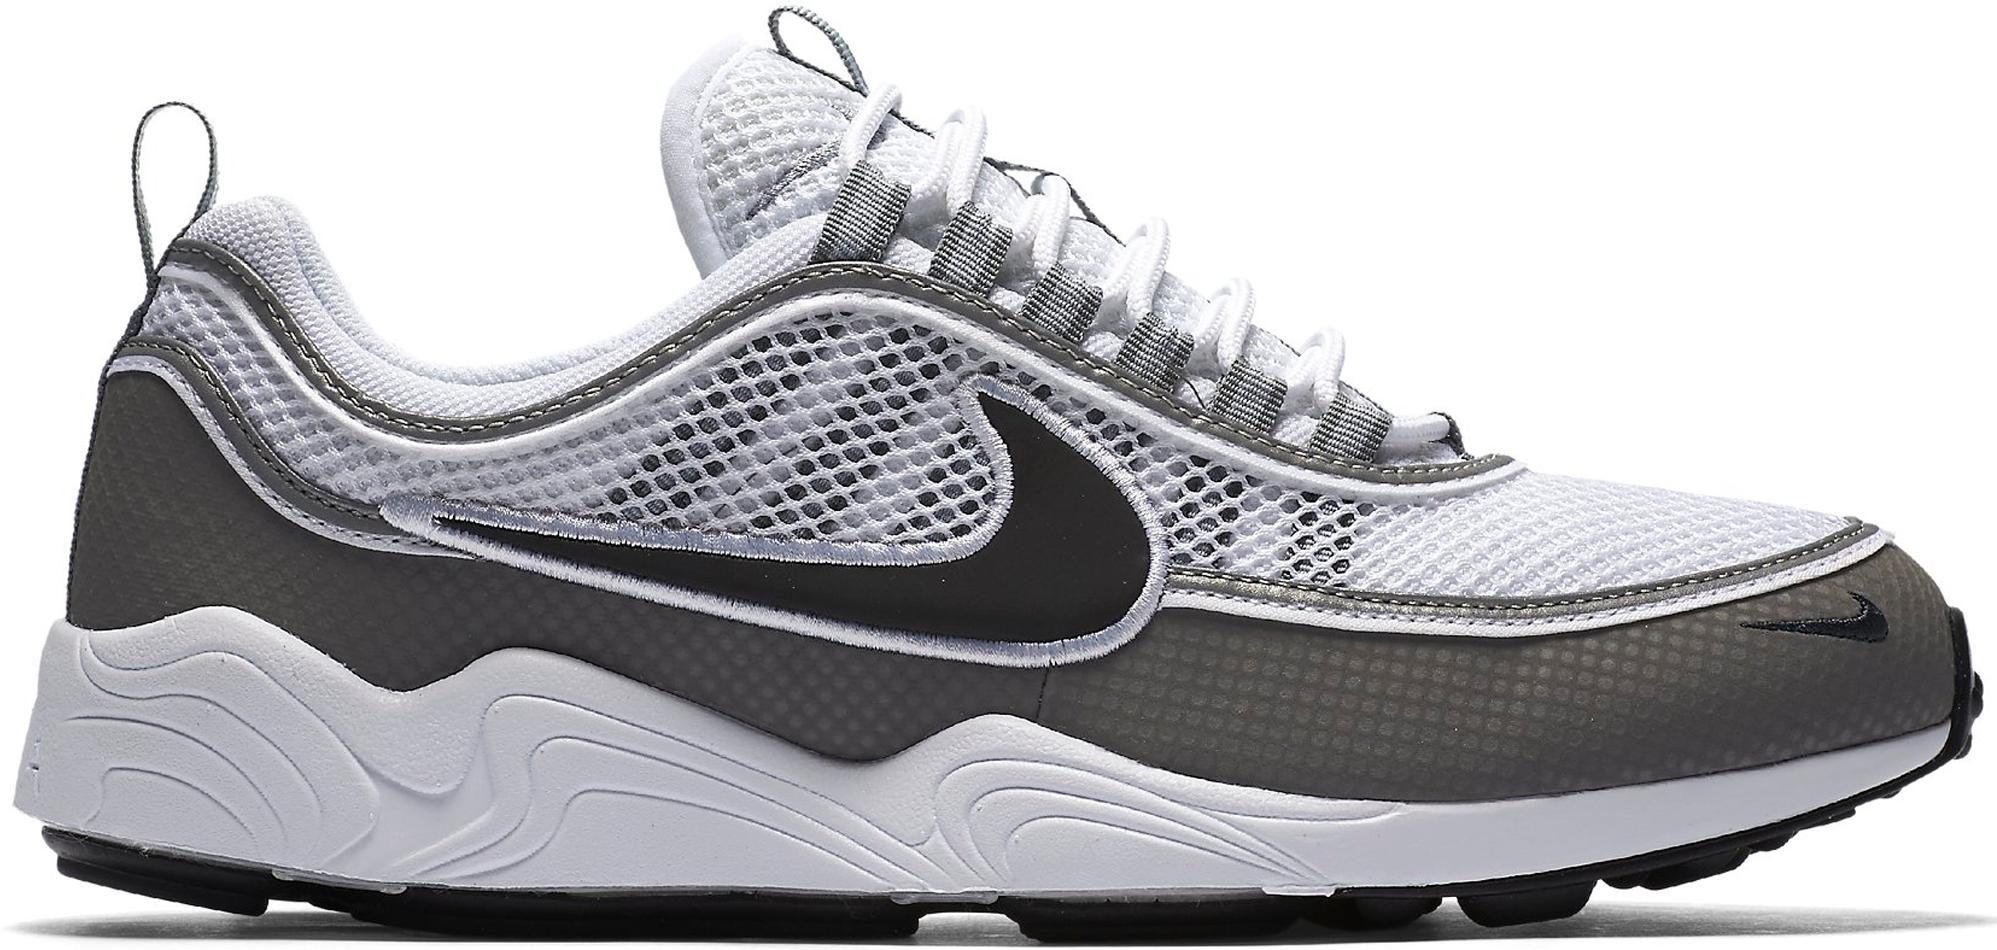 Nike Air Zoom Spiridon White Ash